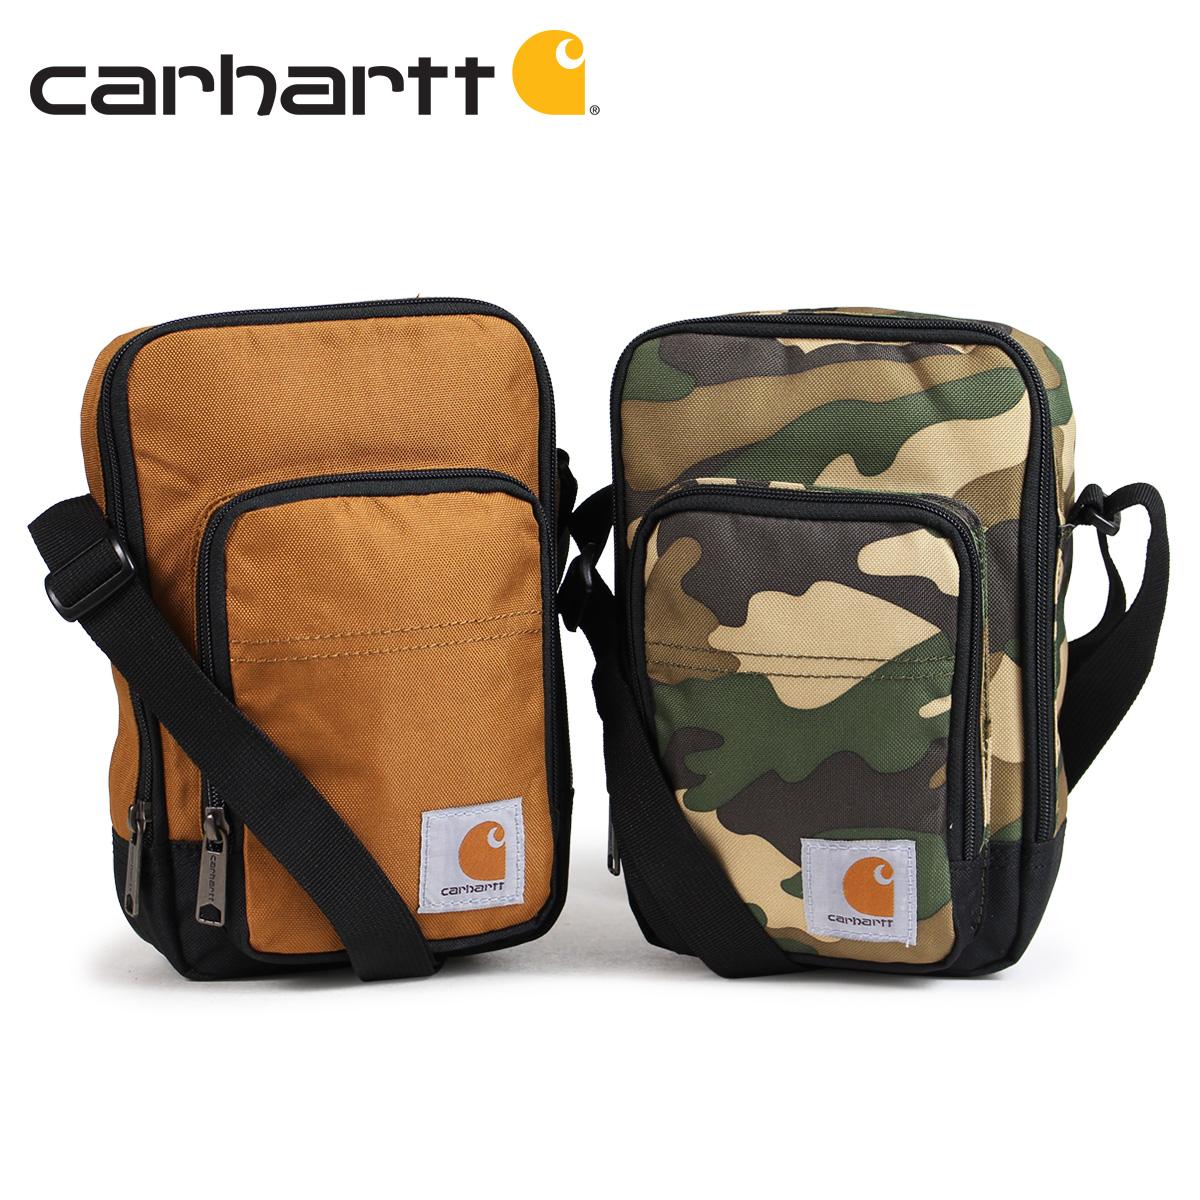 b625269ab0a5 carhartt car heart bag shoulder bag men gap Dis LEGACY CROSS BODY GEAR  ORGANIZER brown duck 89220700 [7/19 reentry load]